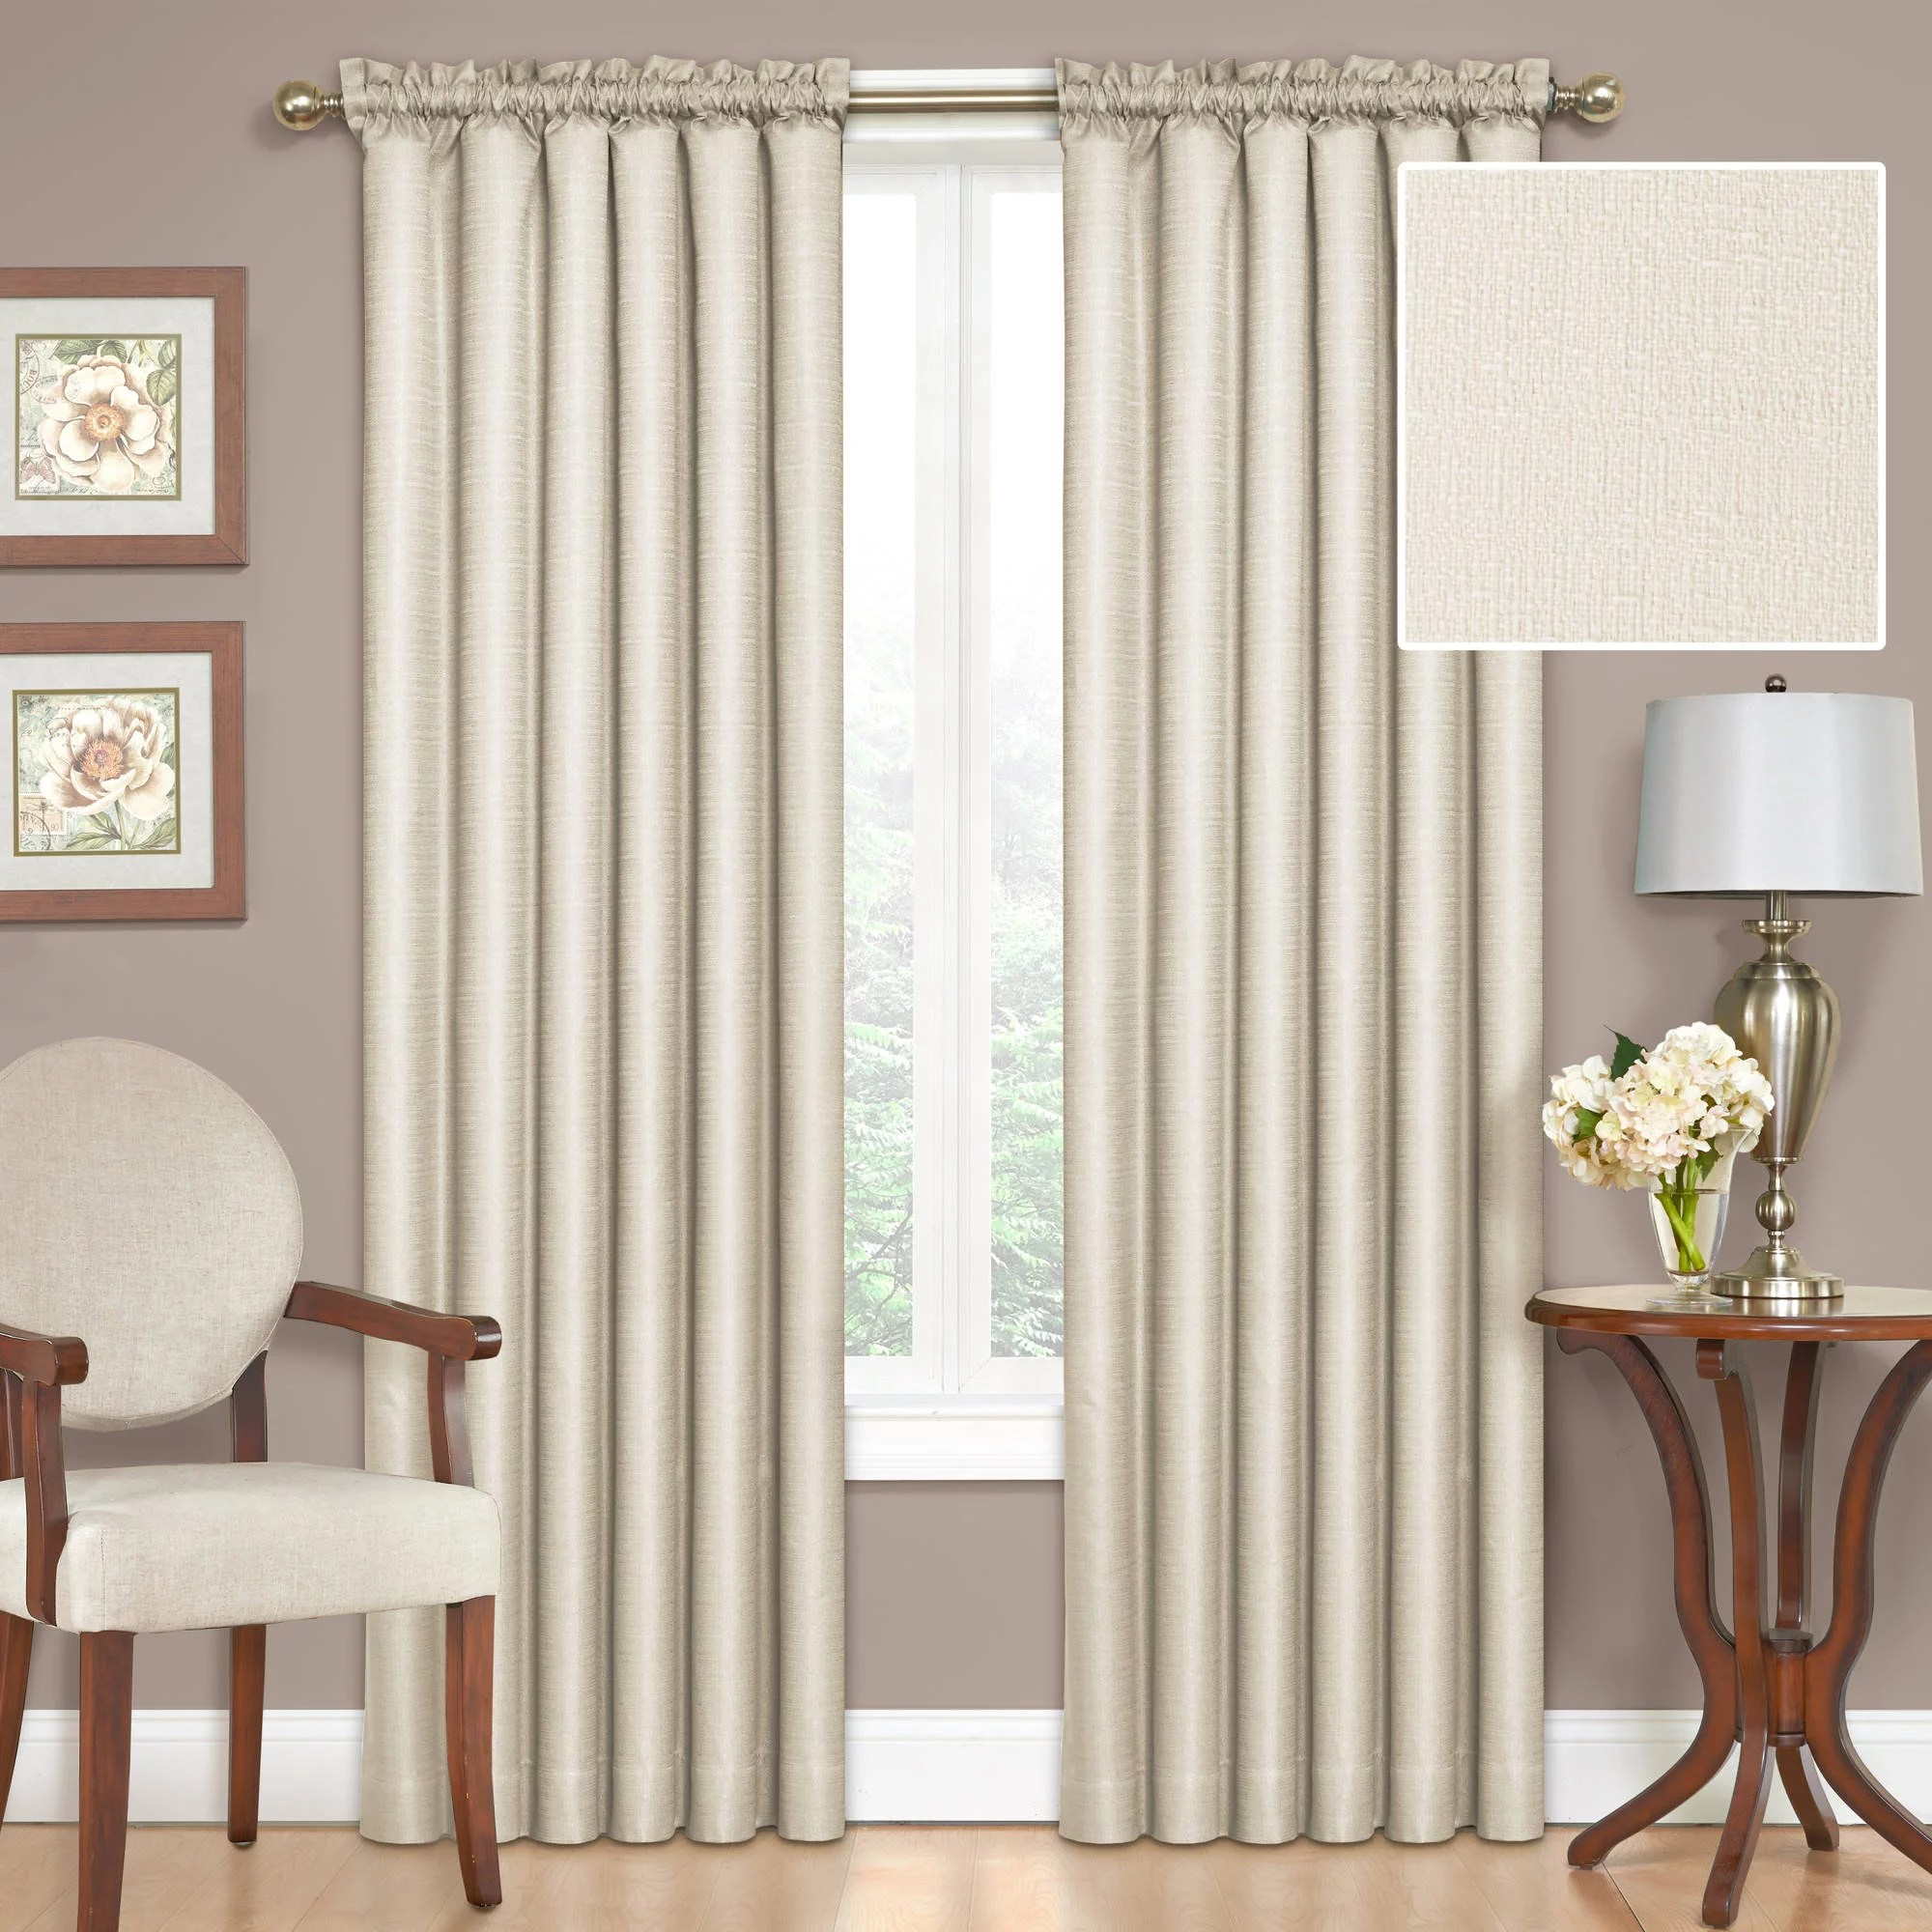 eclipse samara solid color blackout rod pocket single curtain panel ivory 42x54